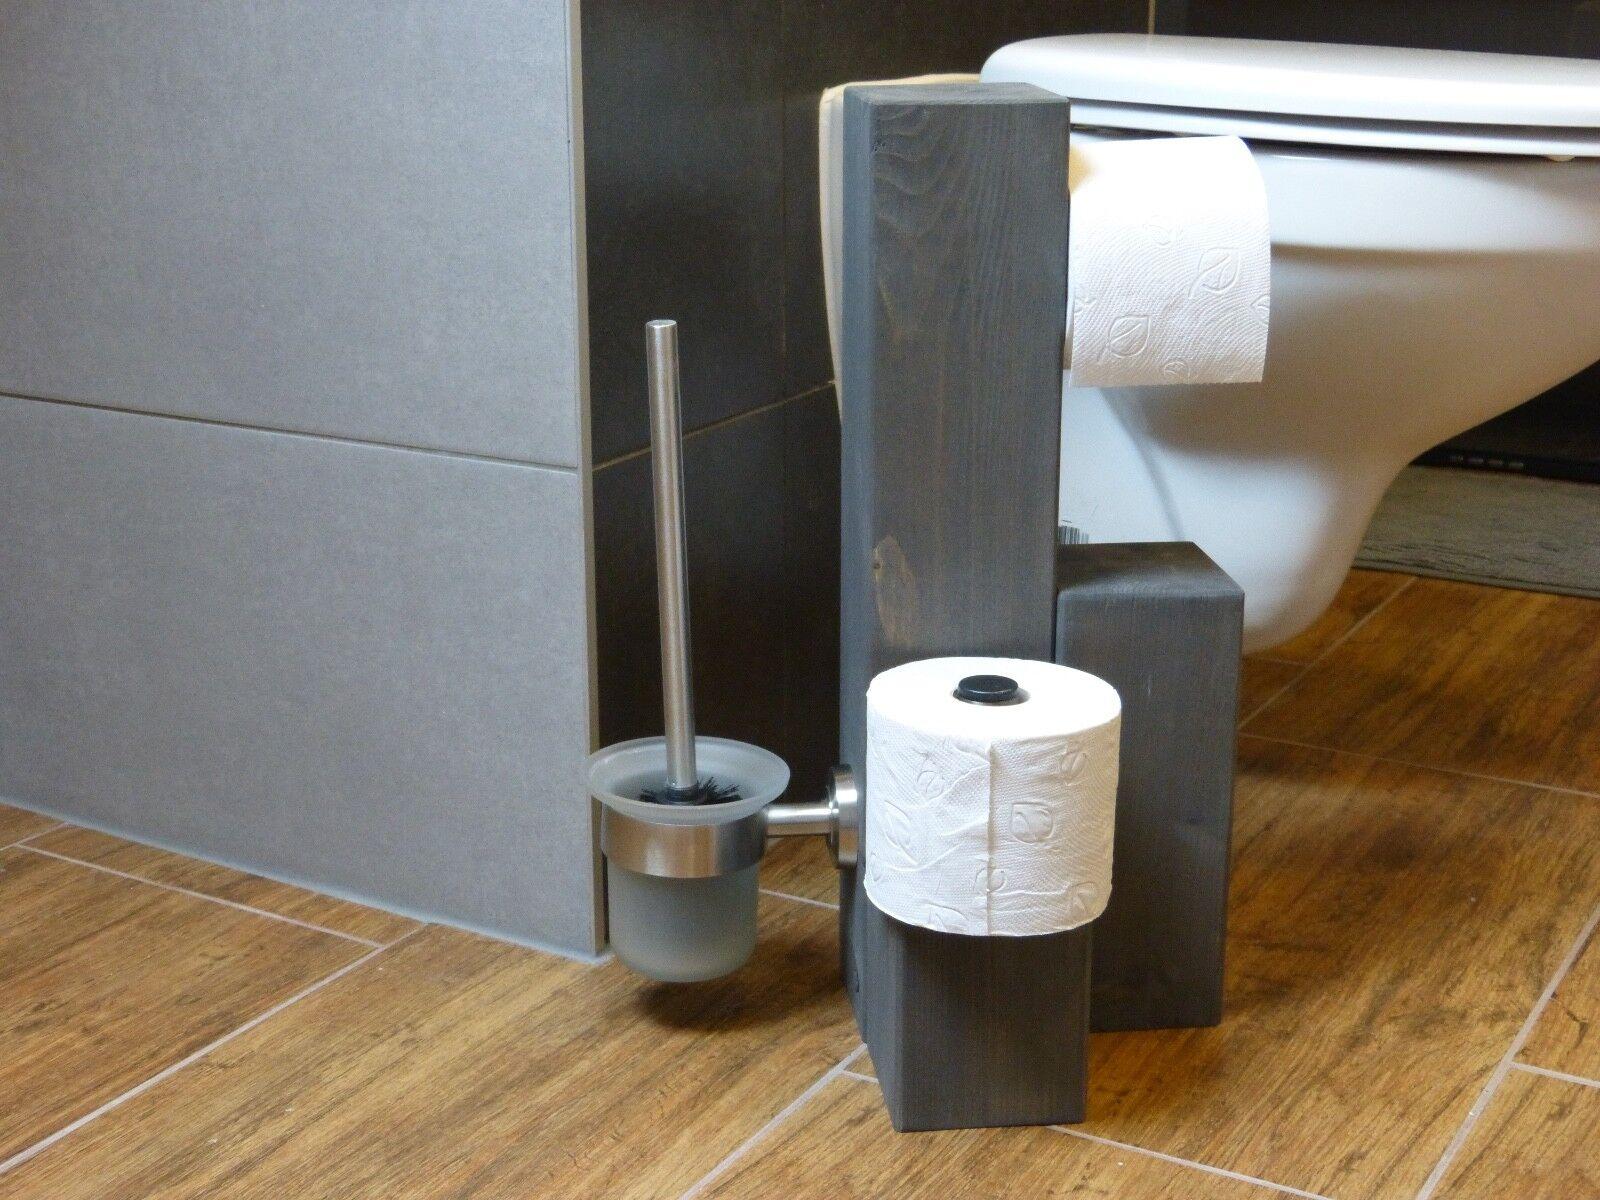 Toiletten-Papier-Halter Massivholz / Edelstahl Badezimmer WC Garnitur Design WC